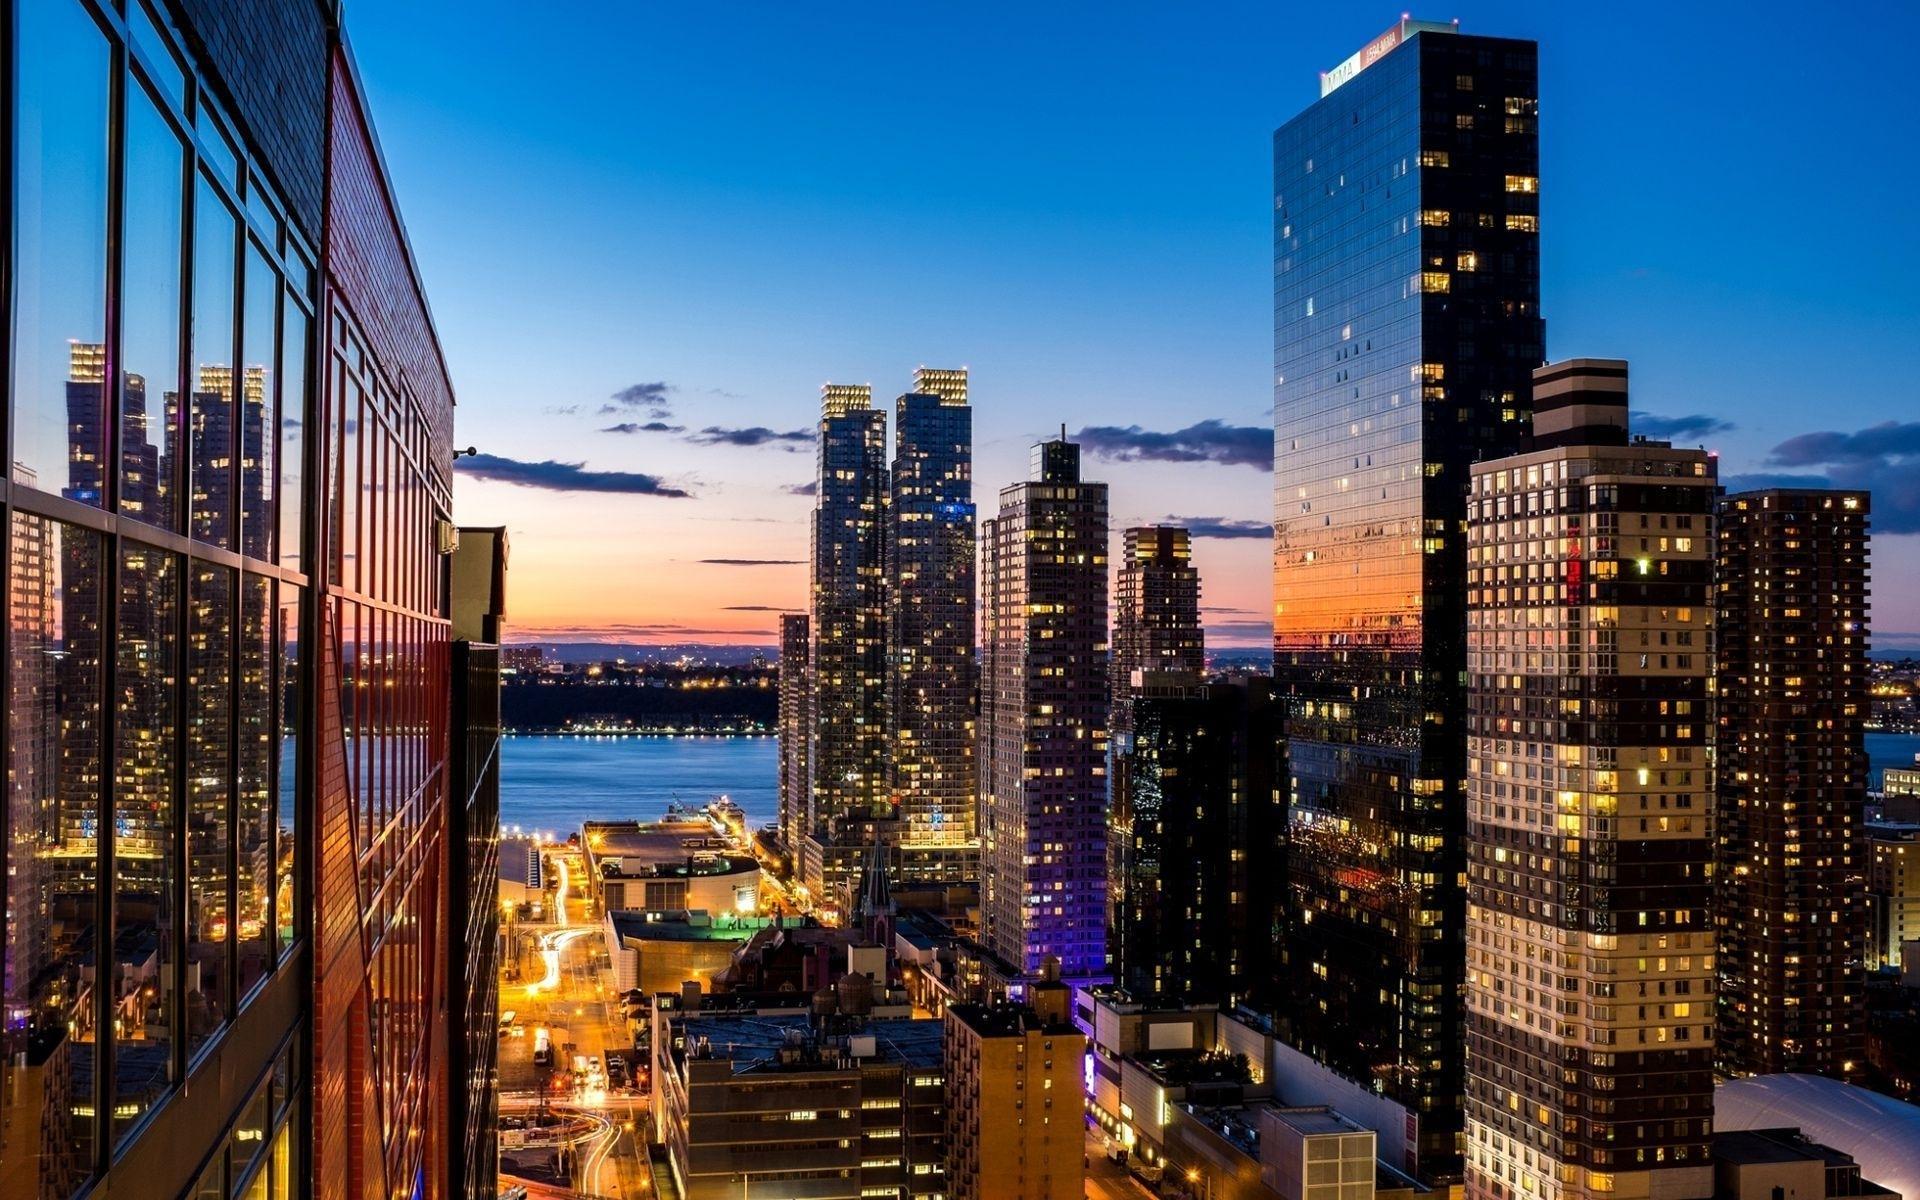 new york desktop wallpaper hd | new york | pinterest | wallpaper and